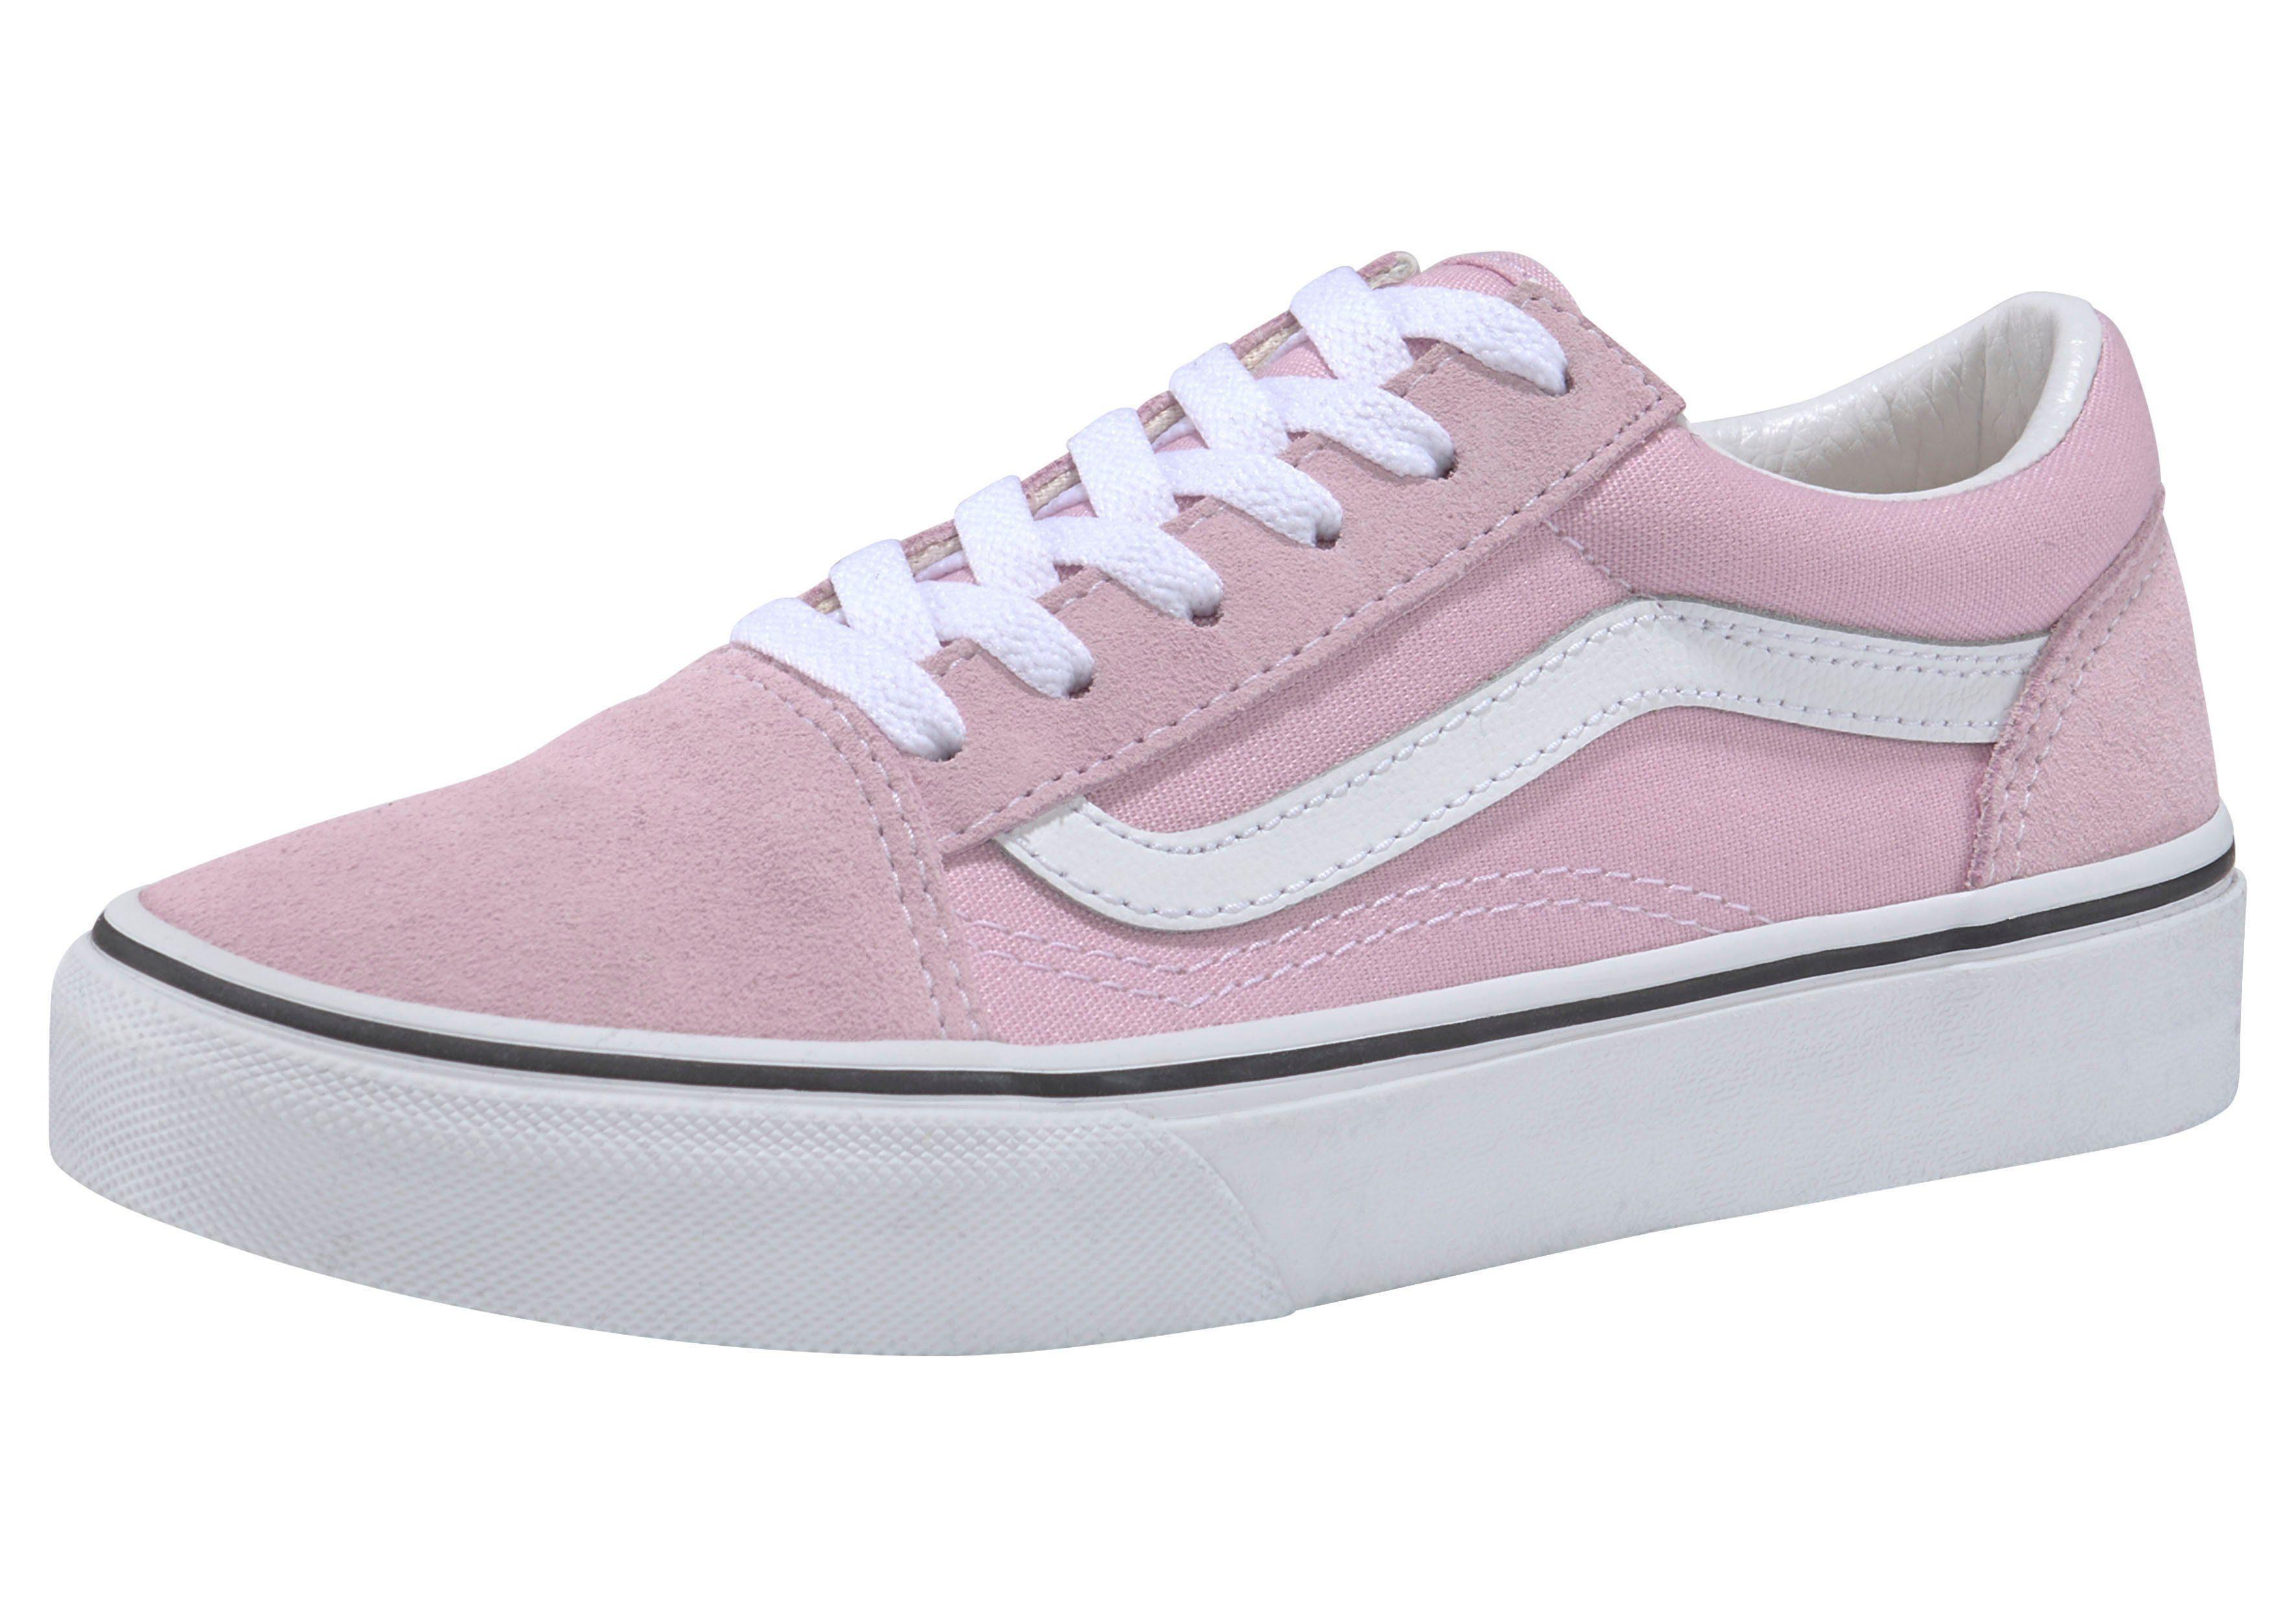 2018 VANS Peanuts Men Women Canvas Shoes Snoopy Cartoon Comic Pink Black Yellow Old Skool Vans Shoe High Top Sk8 hi Casual Sneakers 36 44